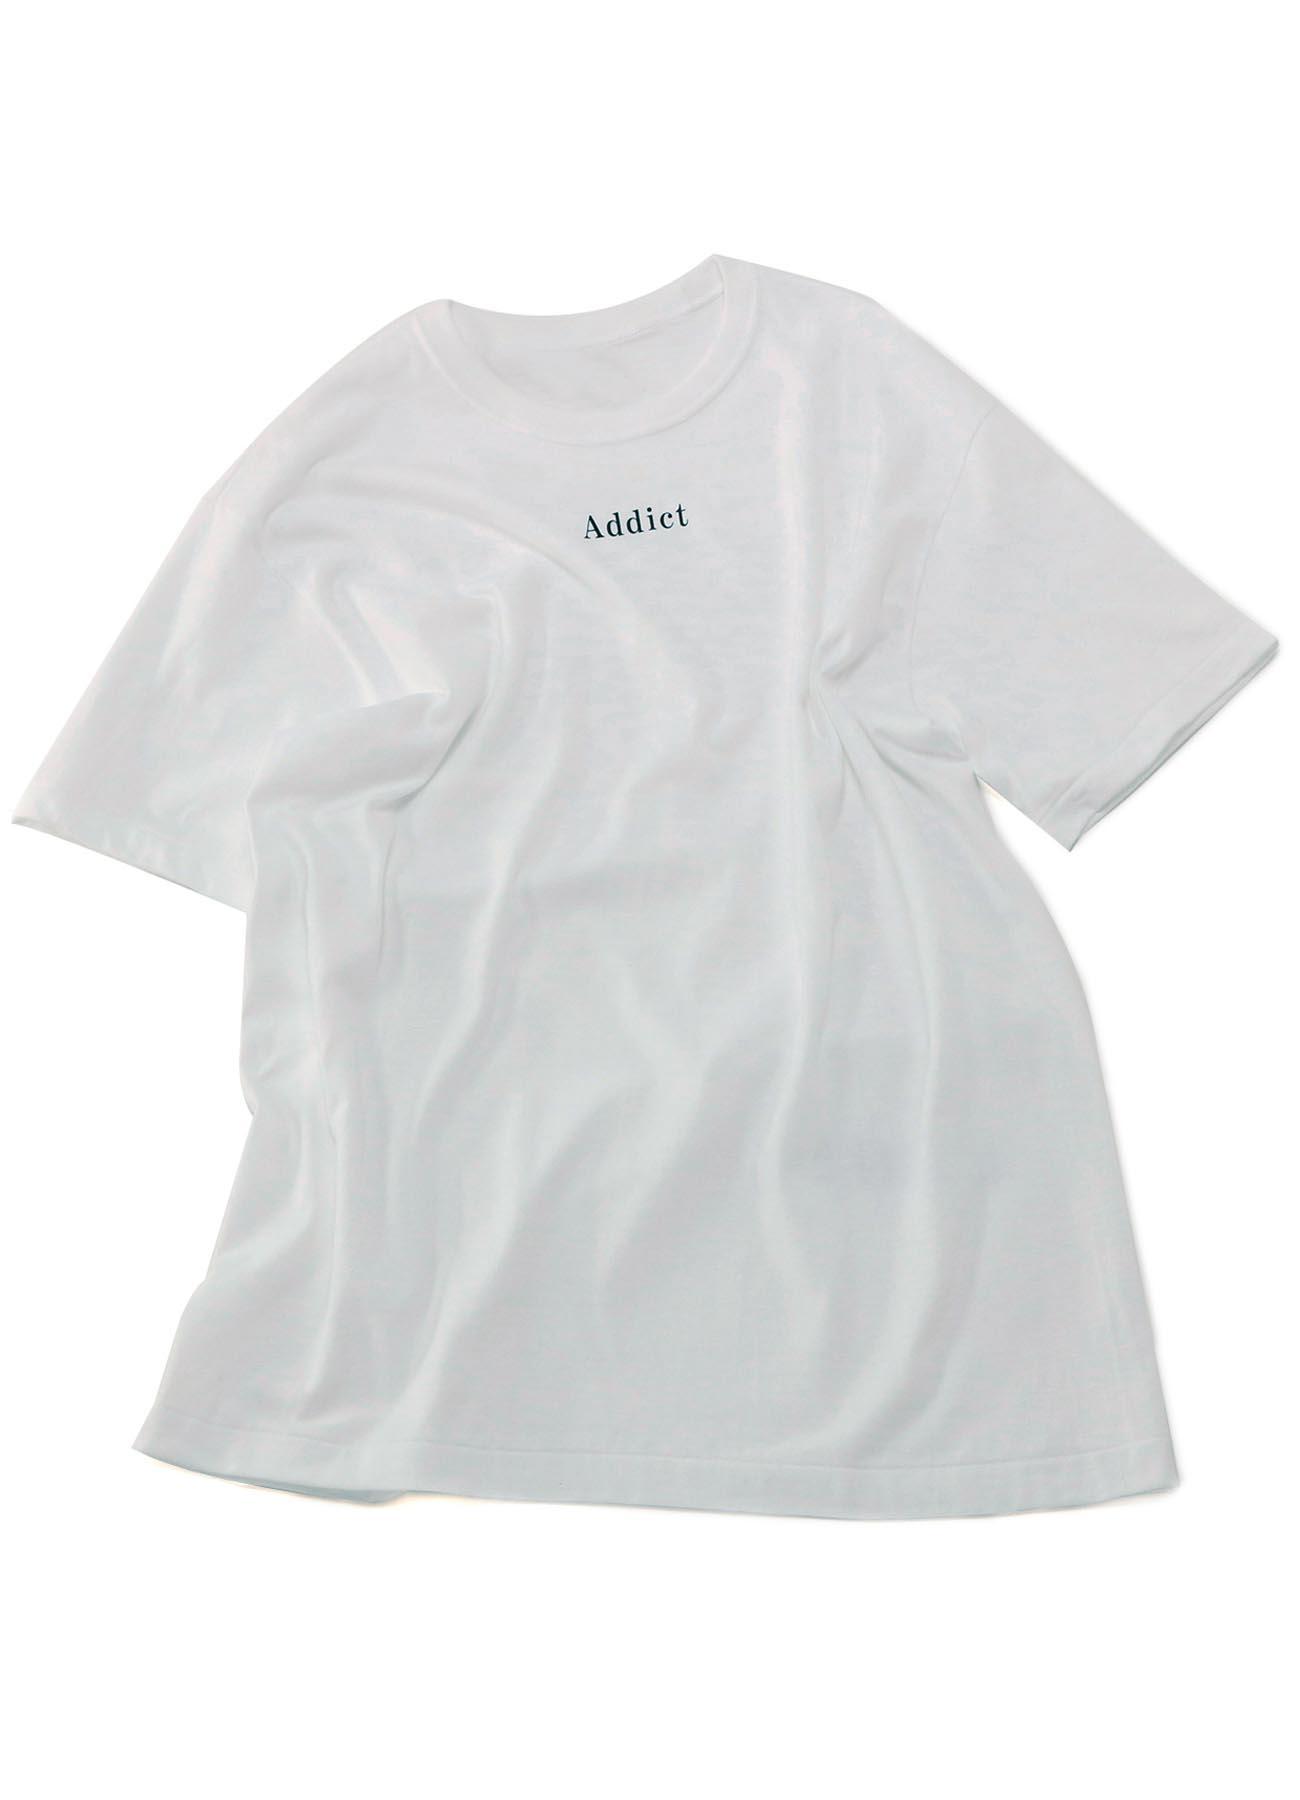 [THE SHOP Limited Product] 20/-Plain Stitch LIMI FEU Print T-Shirt C